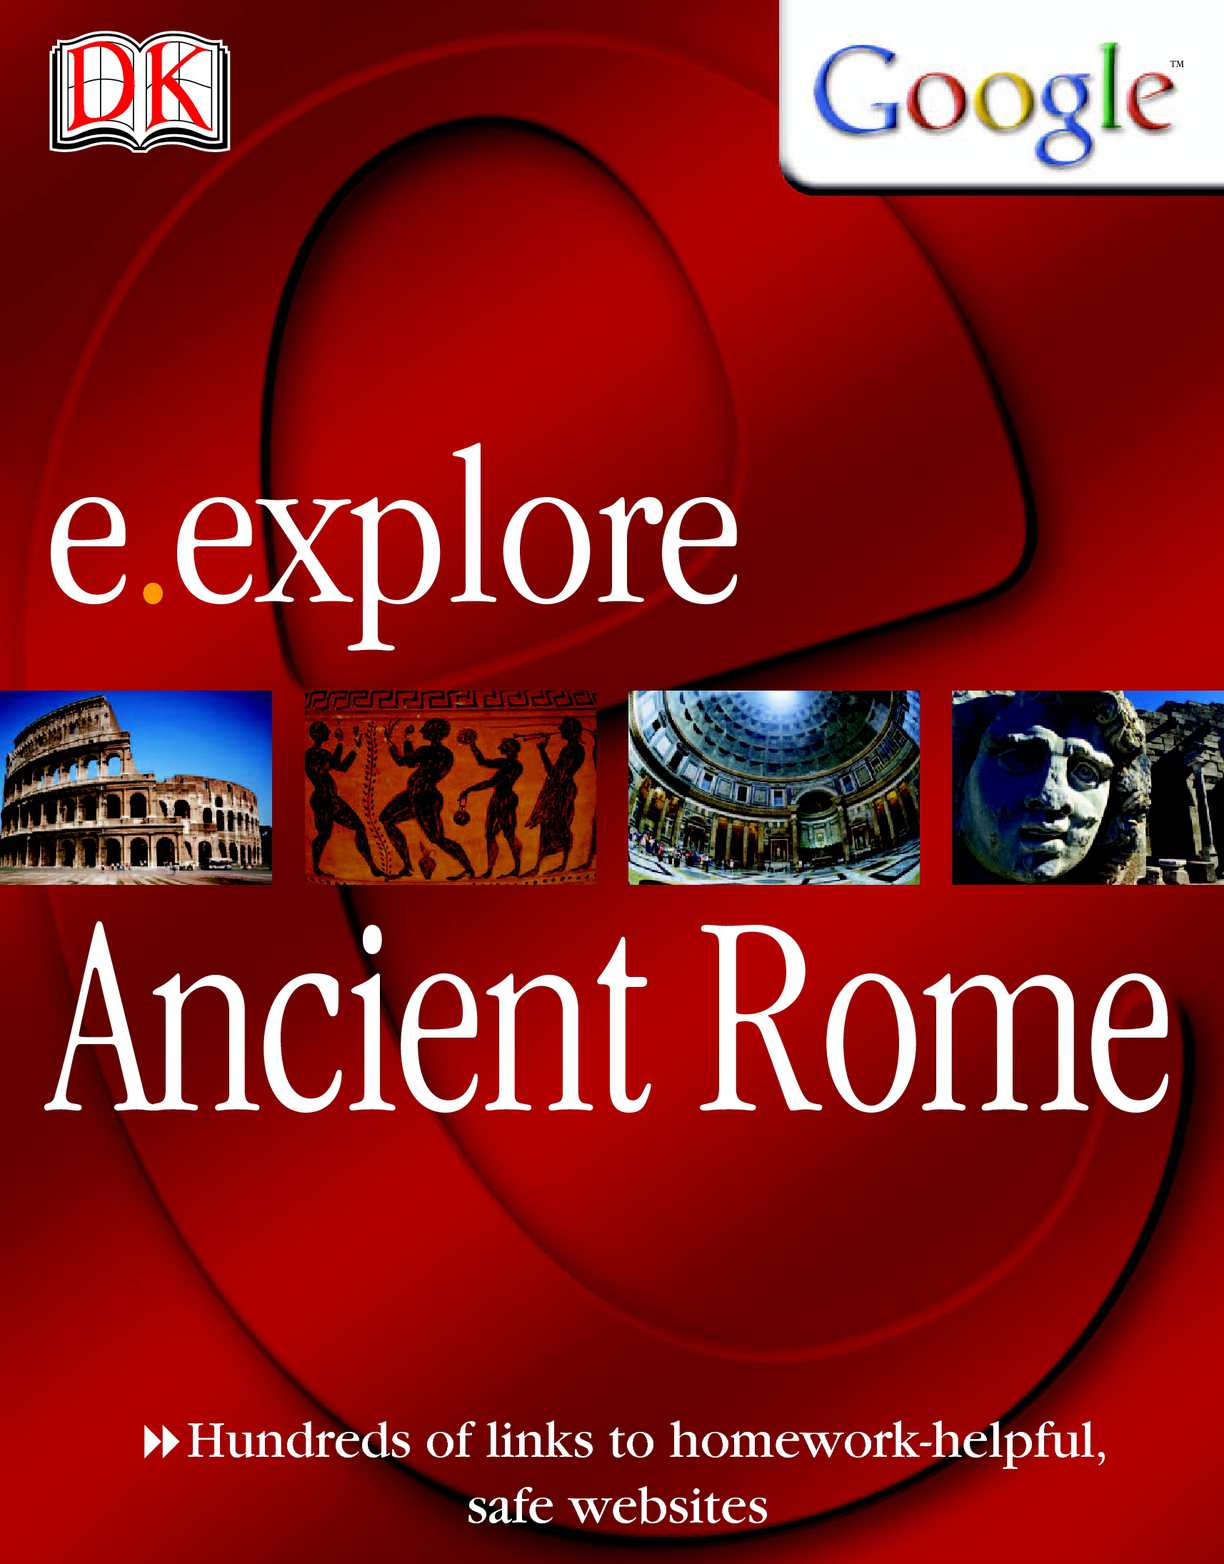 1405313323_DK_Ancient_Rome